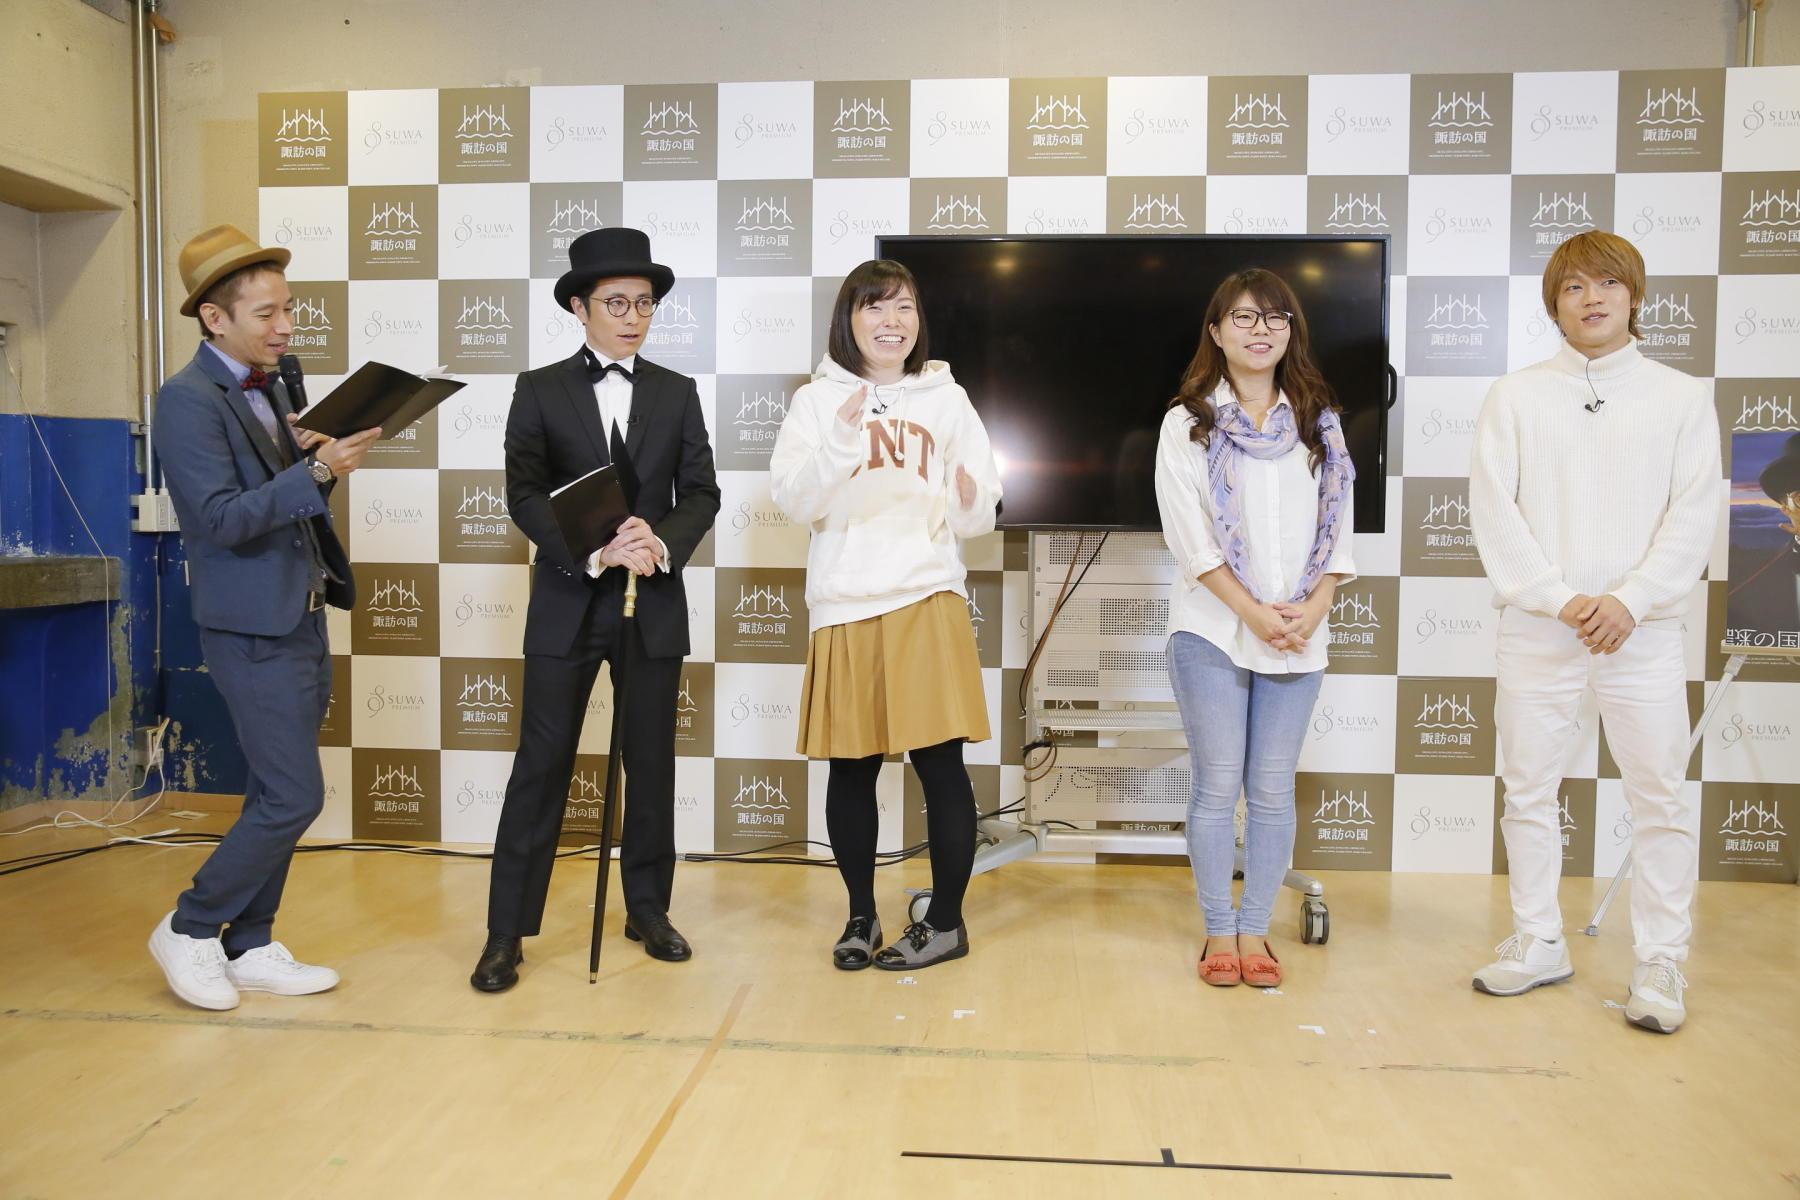 http://news.yoshimoto.co.jp/20171108161309-aa42219968b3959566d4ea5fe30d97b54980d312.jpg